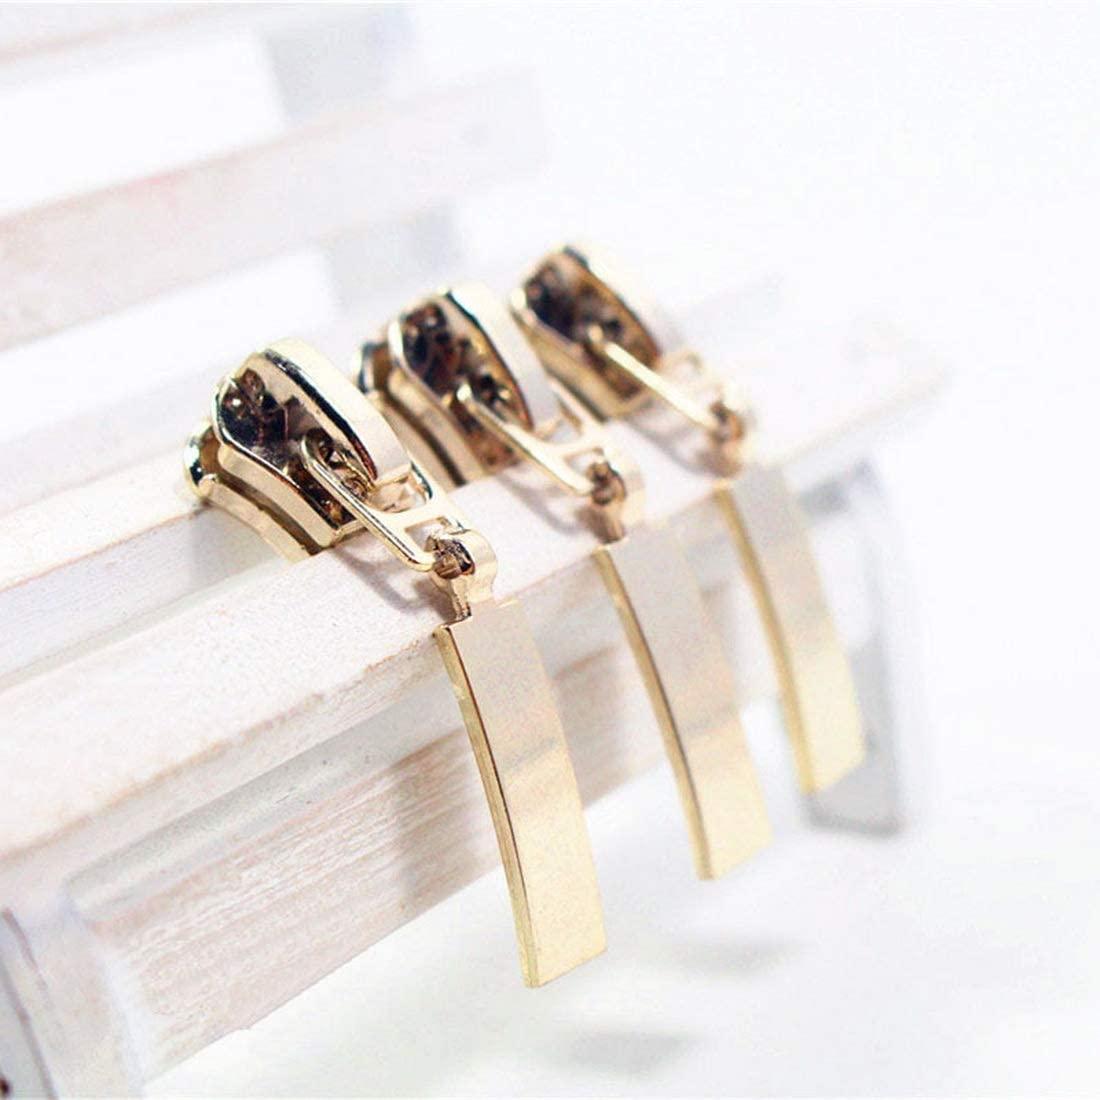 TAYARA 5 Pcs #5 Fashion Zipper Repair kit Bulk Universal Replacement Slider Sewing Hobby Lobby Corset Clothes Bag Jackets Tents Luggage Sleeping for DIY Handwork Clothing Tailor Tools (8. Gold)